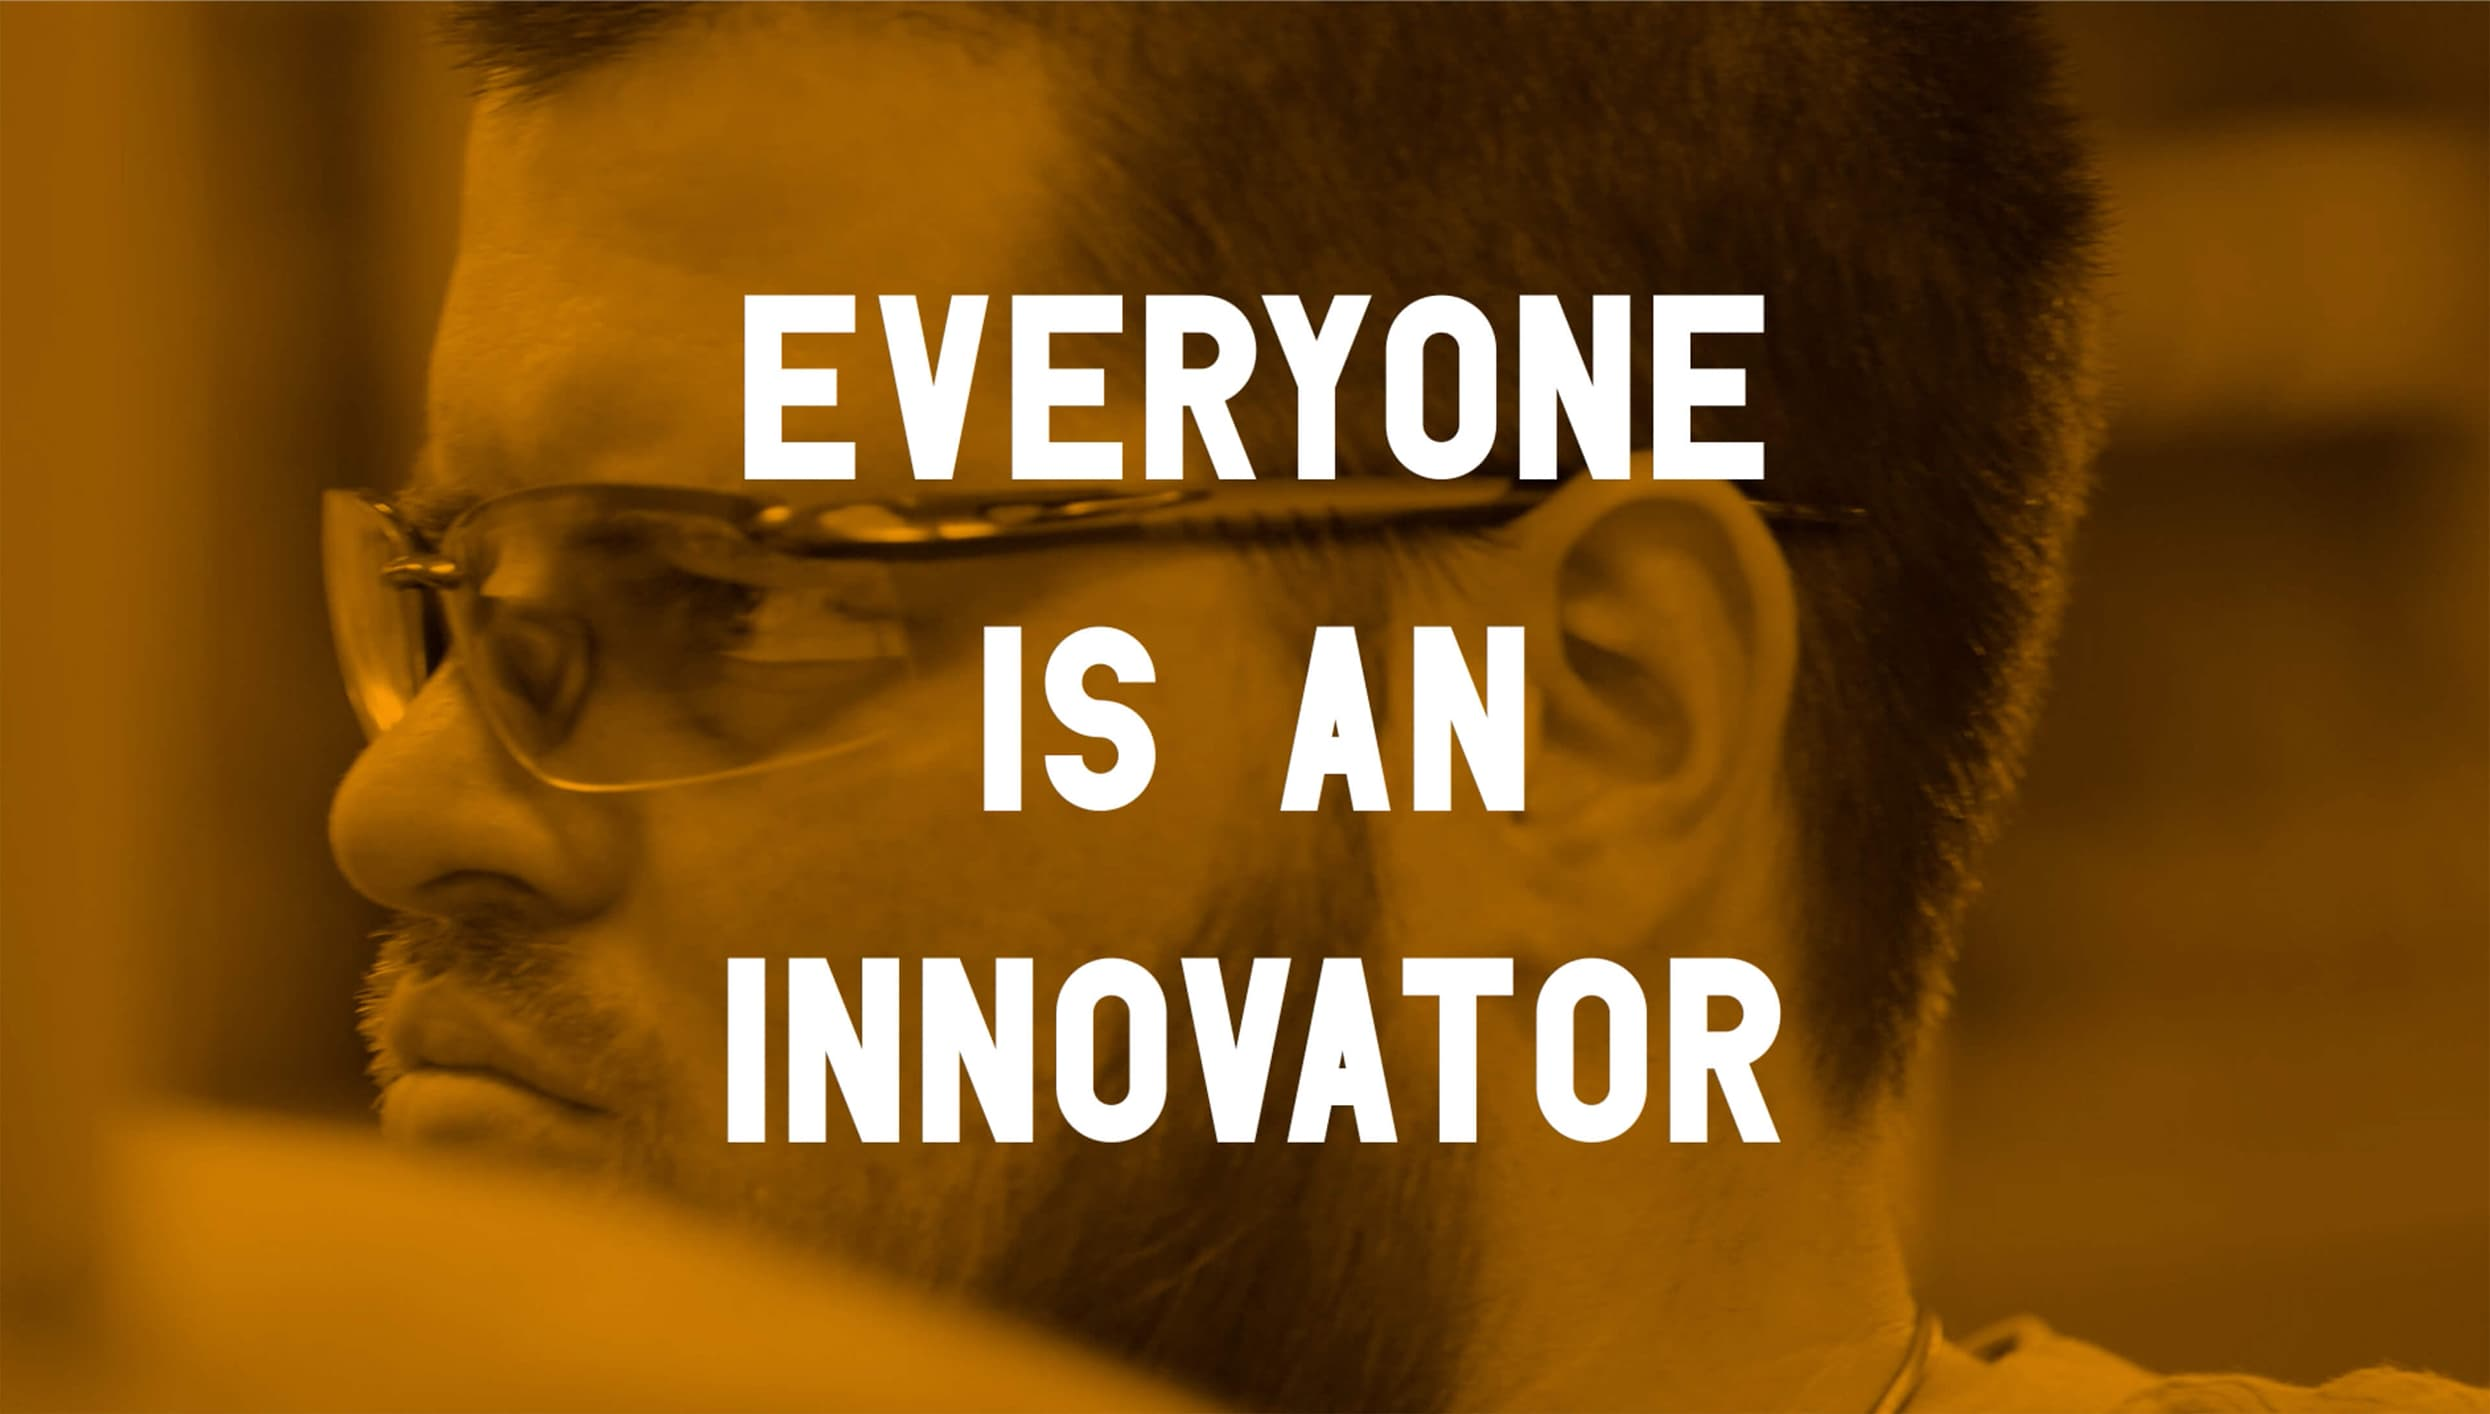 Everyone is an Innovator